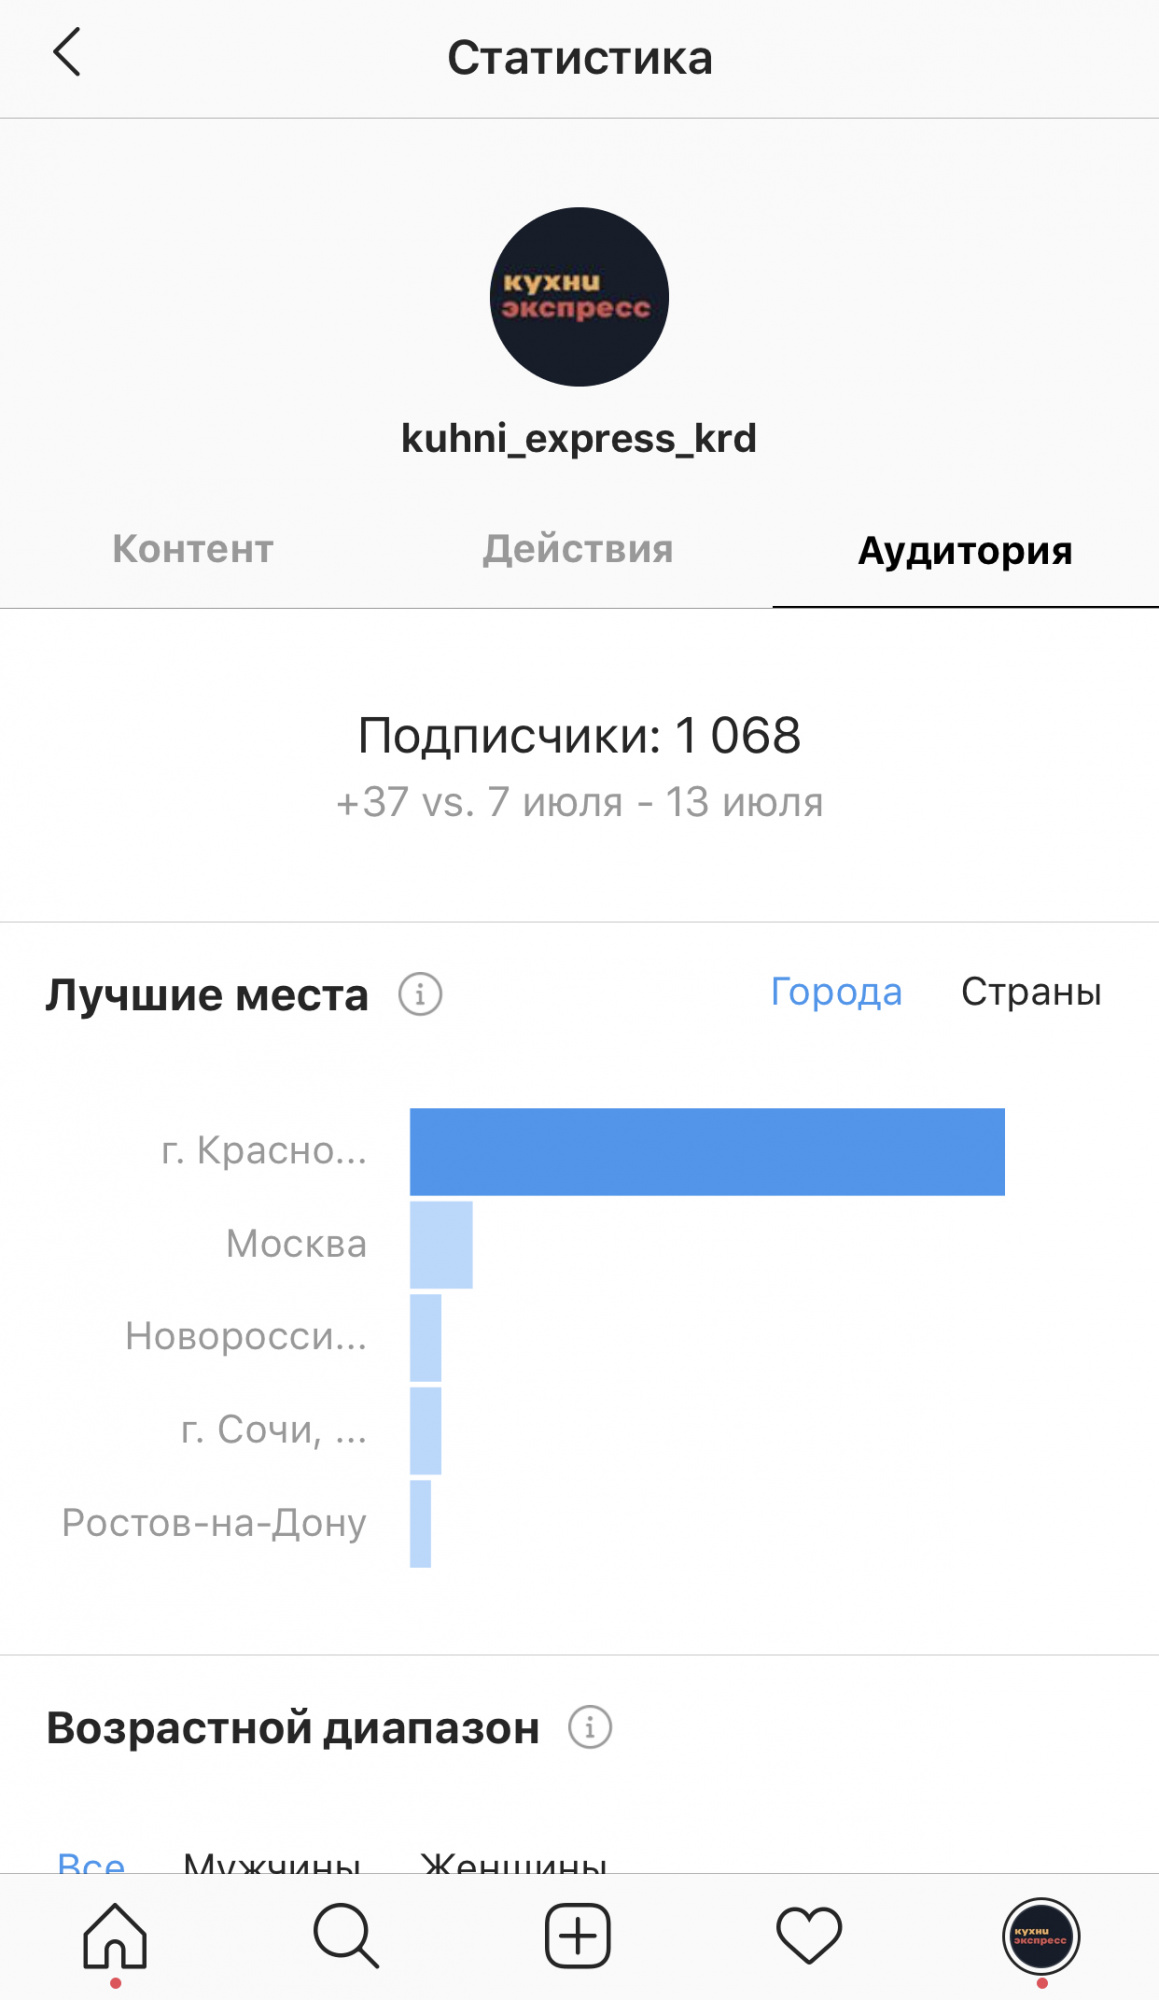 Статистика Аудитория